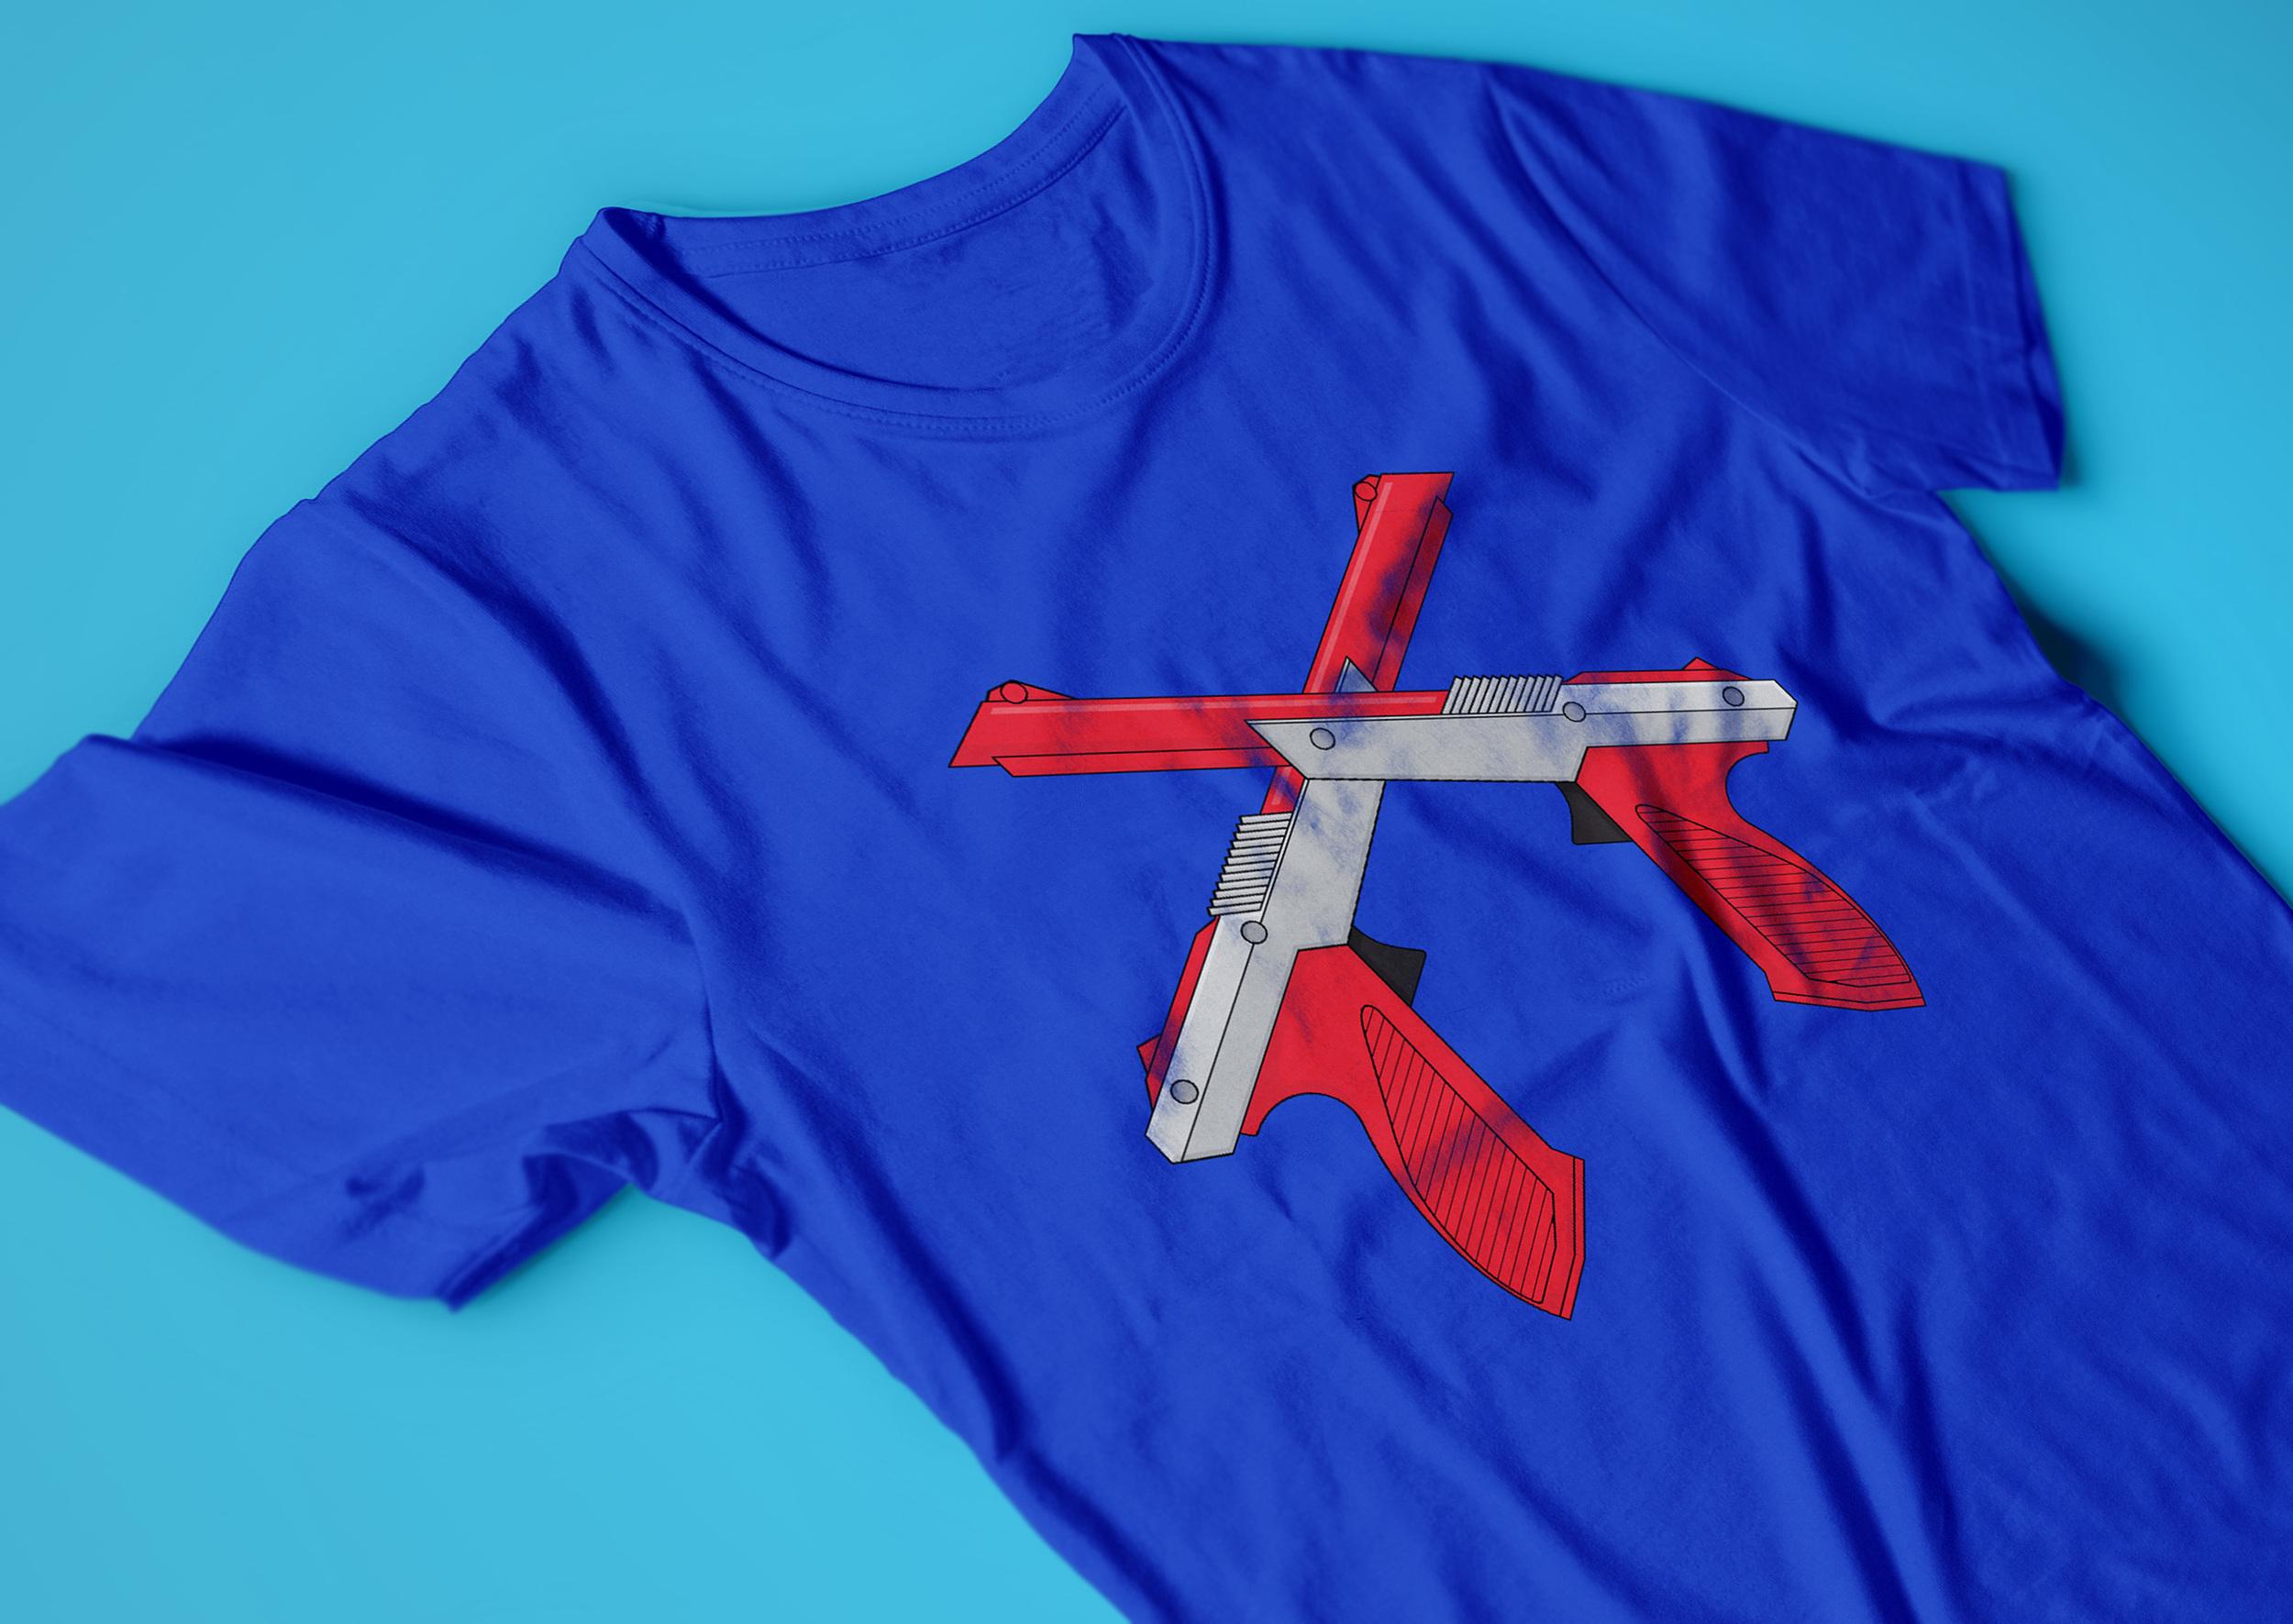 Nintendo NES t-shirt with dueling controller guns